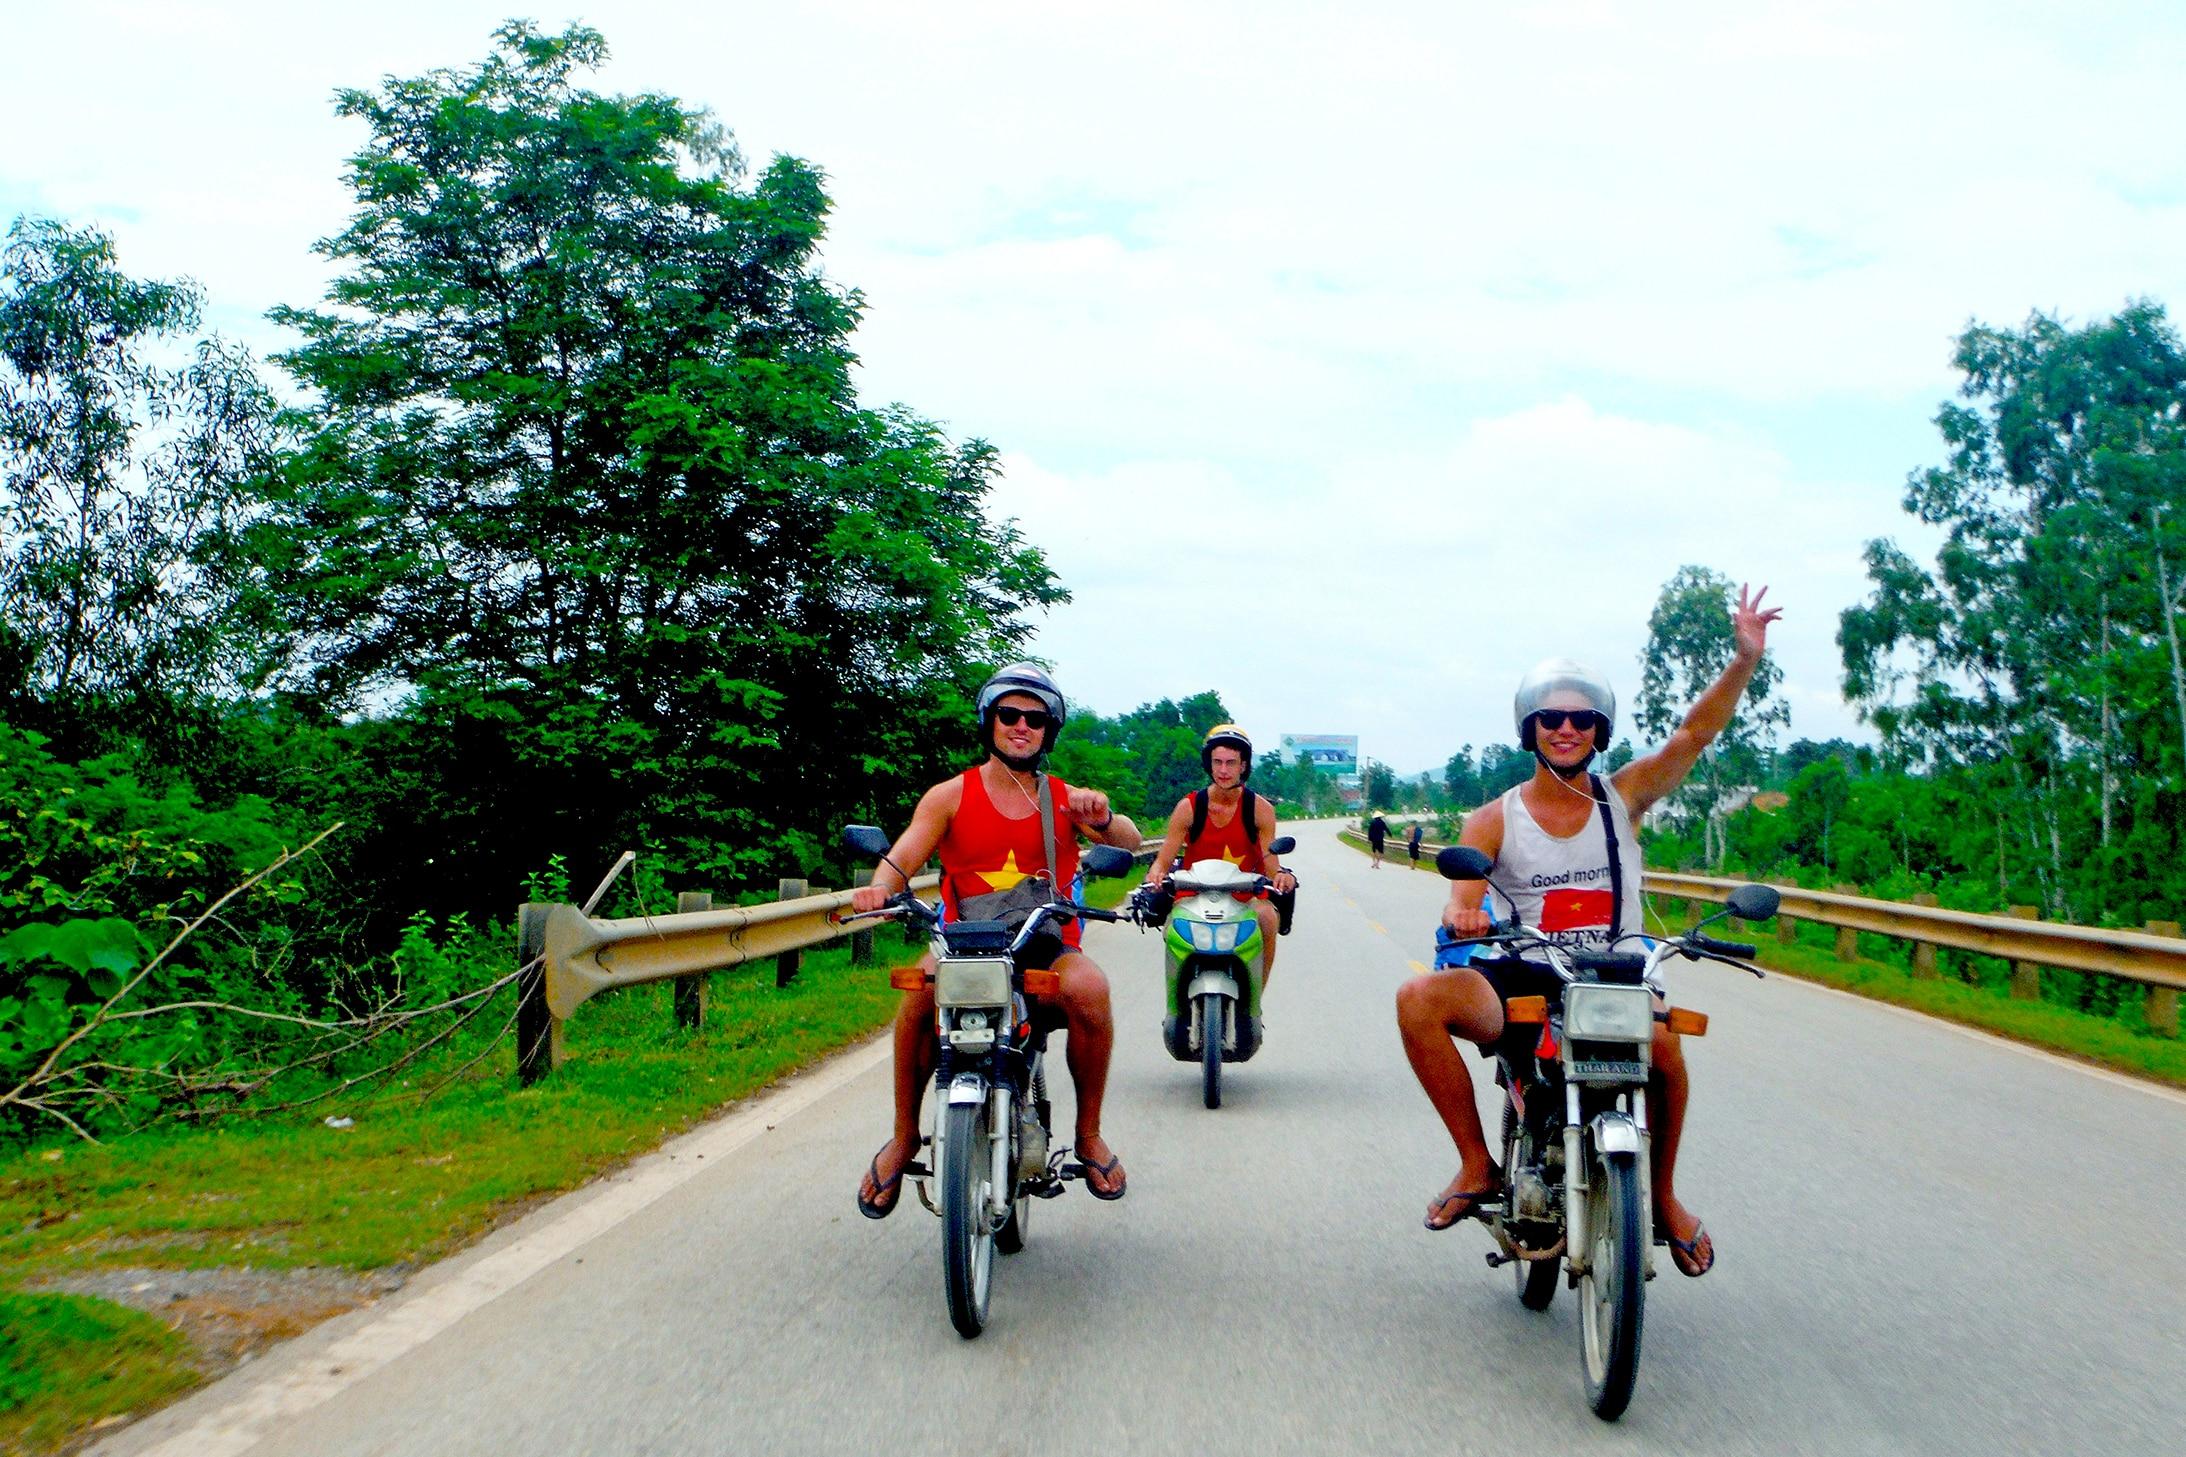 Men riding motorbikes towards camera